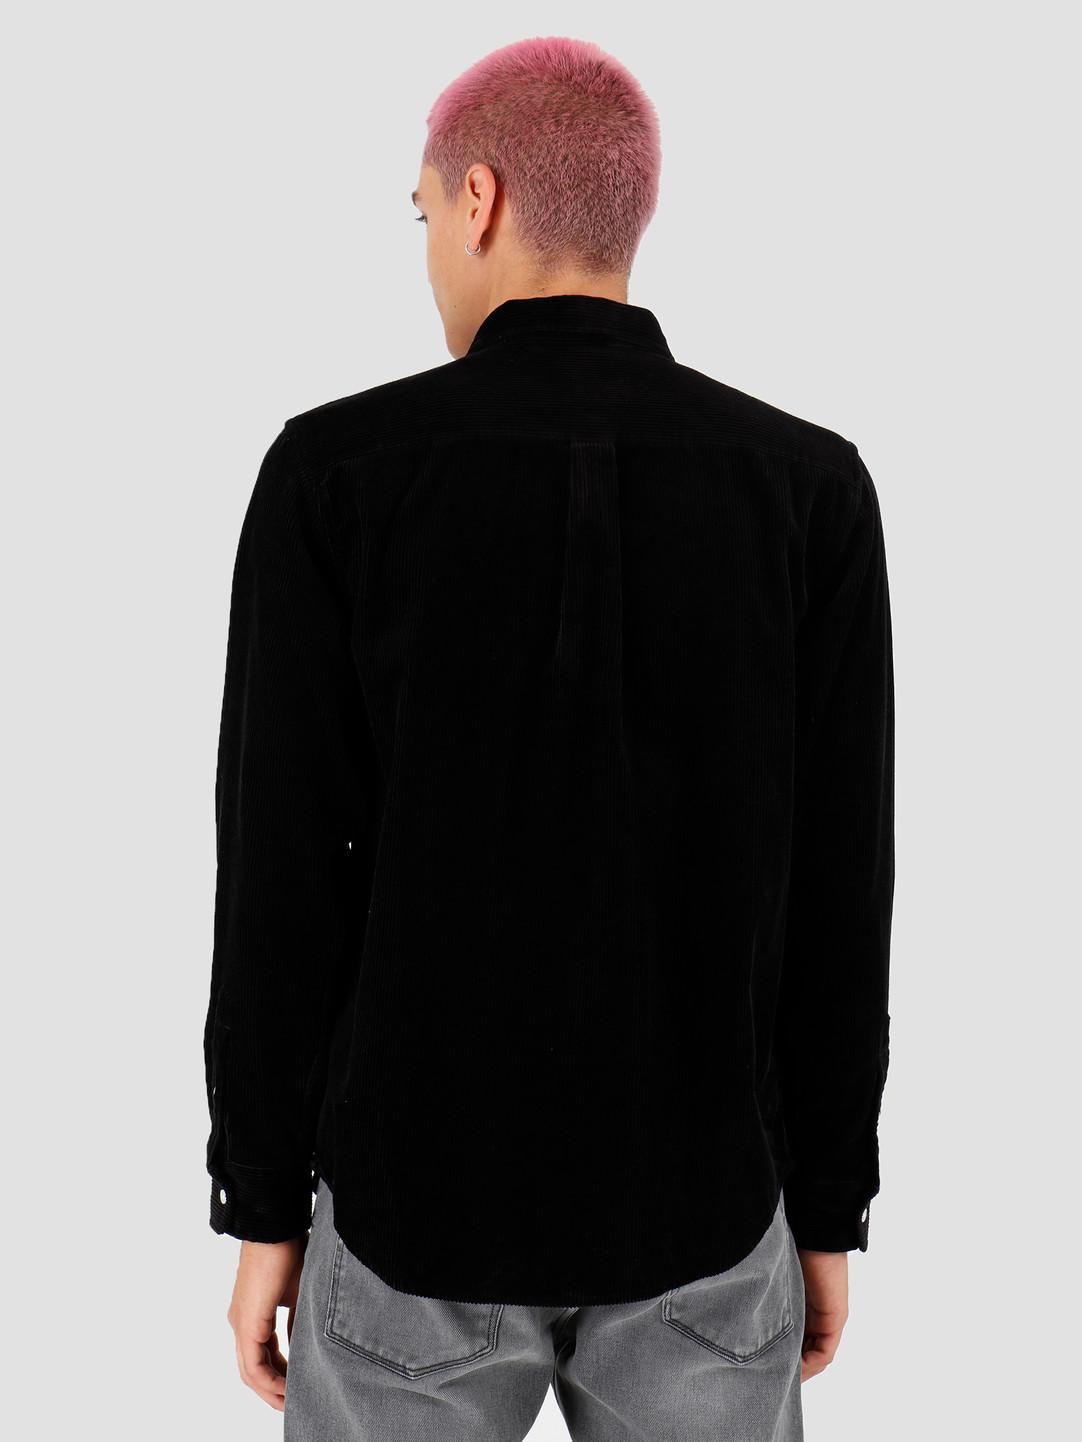 Carhartt WIP Carhartt WIP Longsleeve Madison Cord Shirt Black White I025247